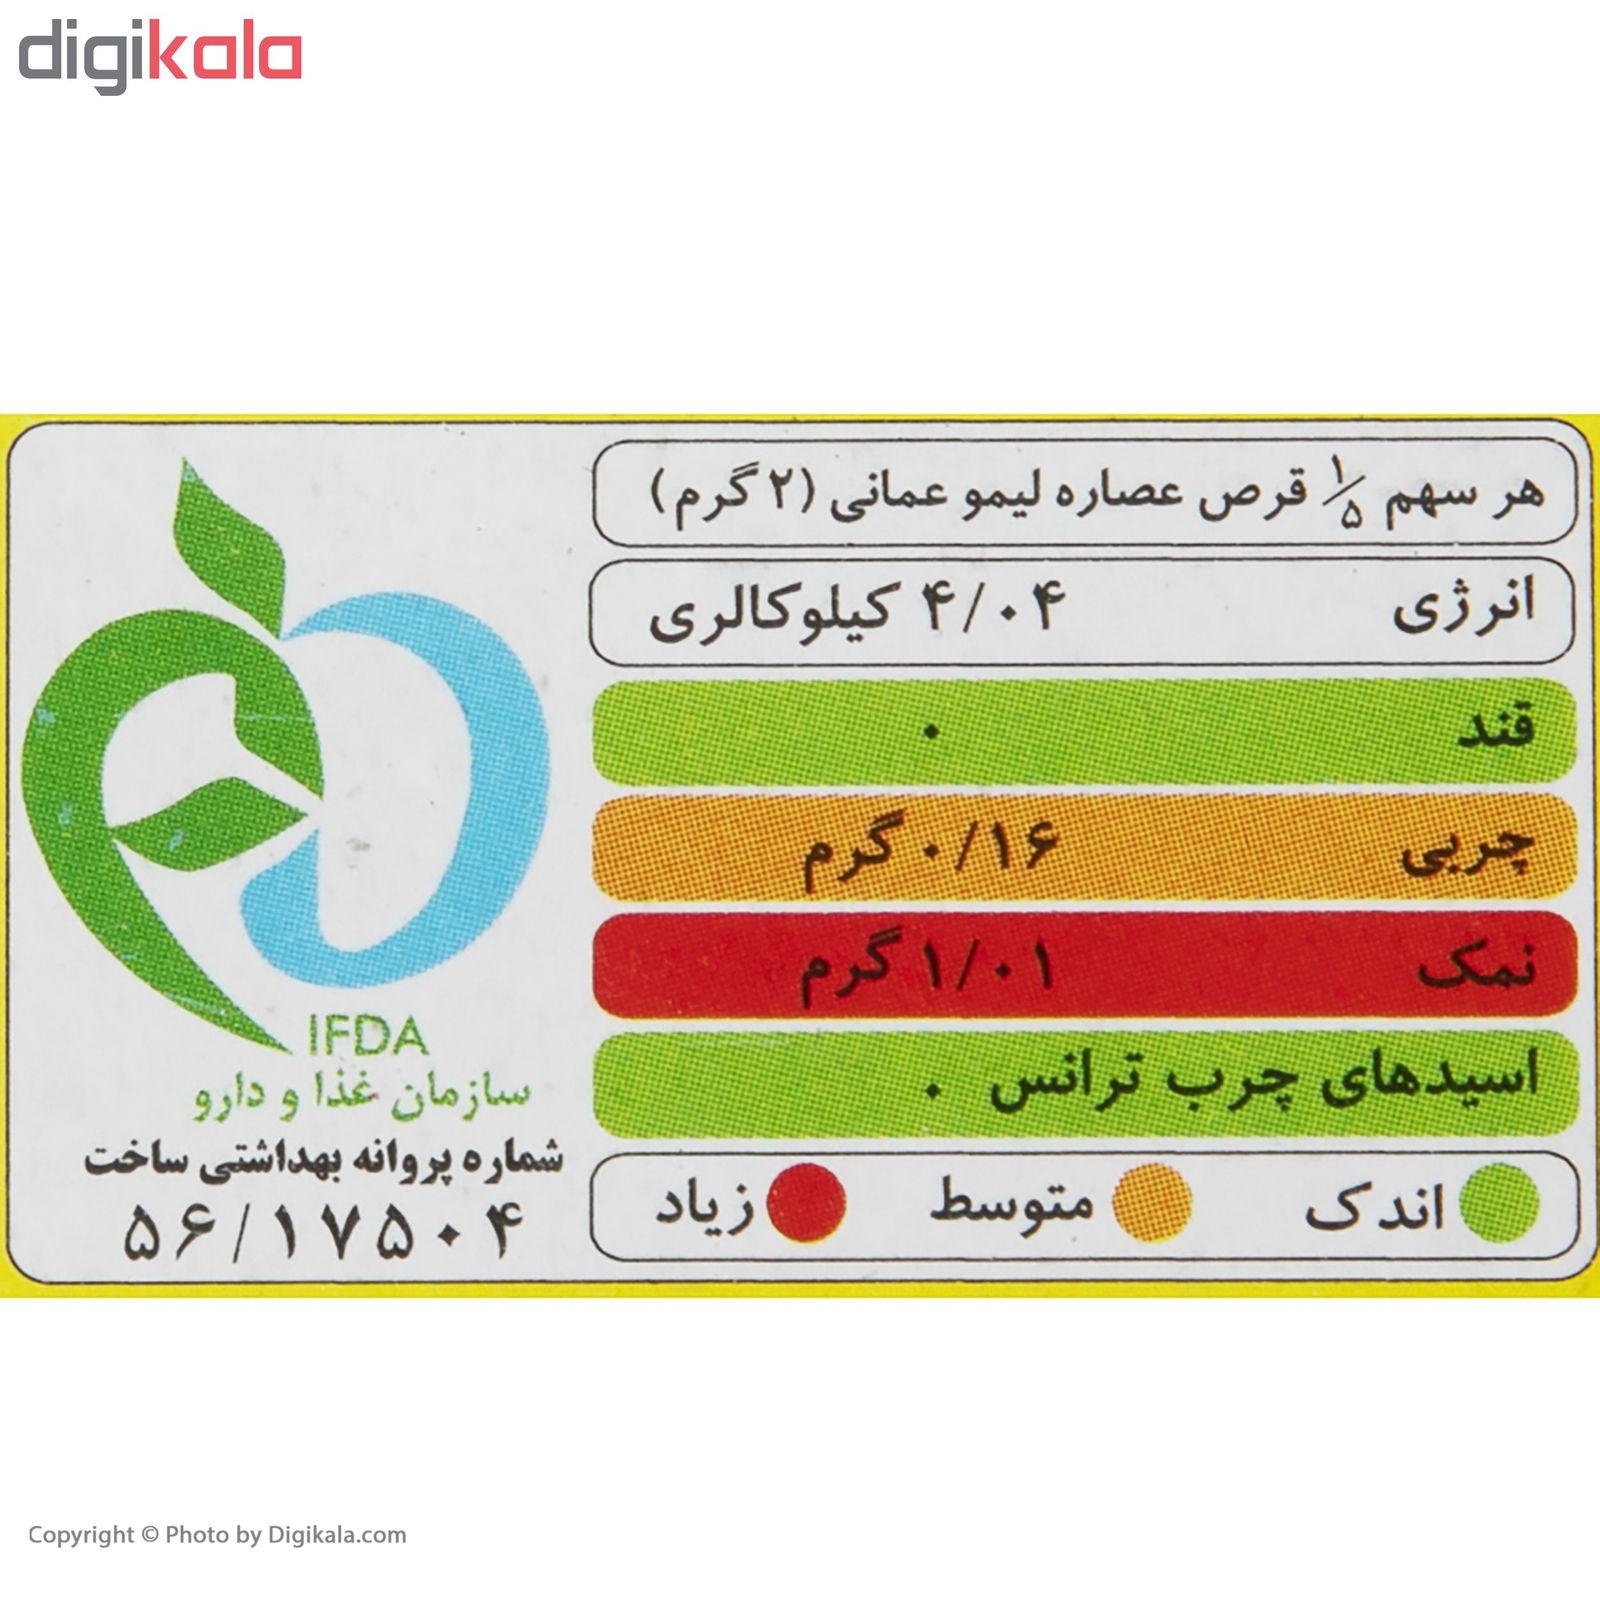 پودر عصاره لیمو عمانی الیت مقدار 80 گرم main 1 2